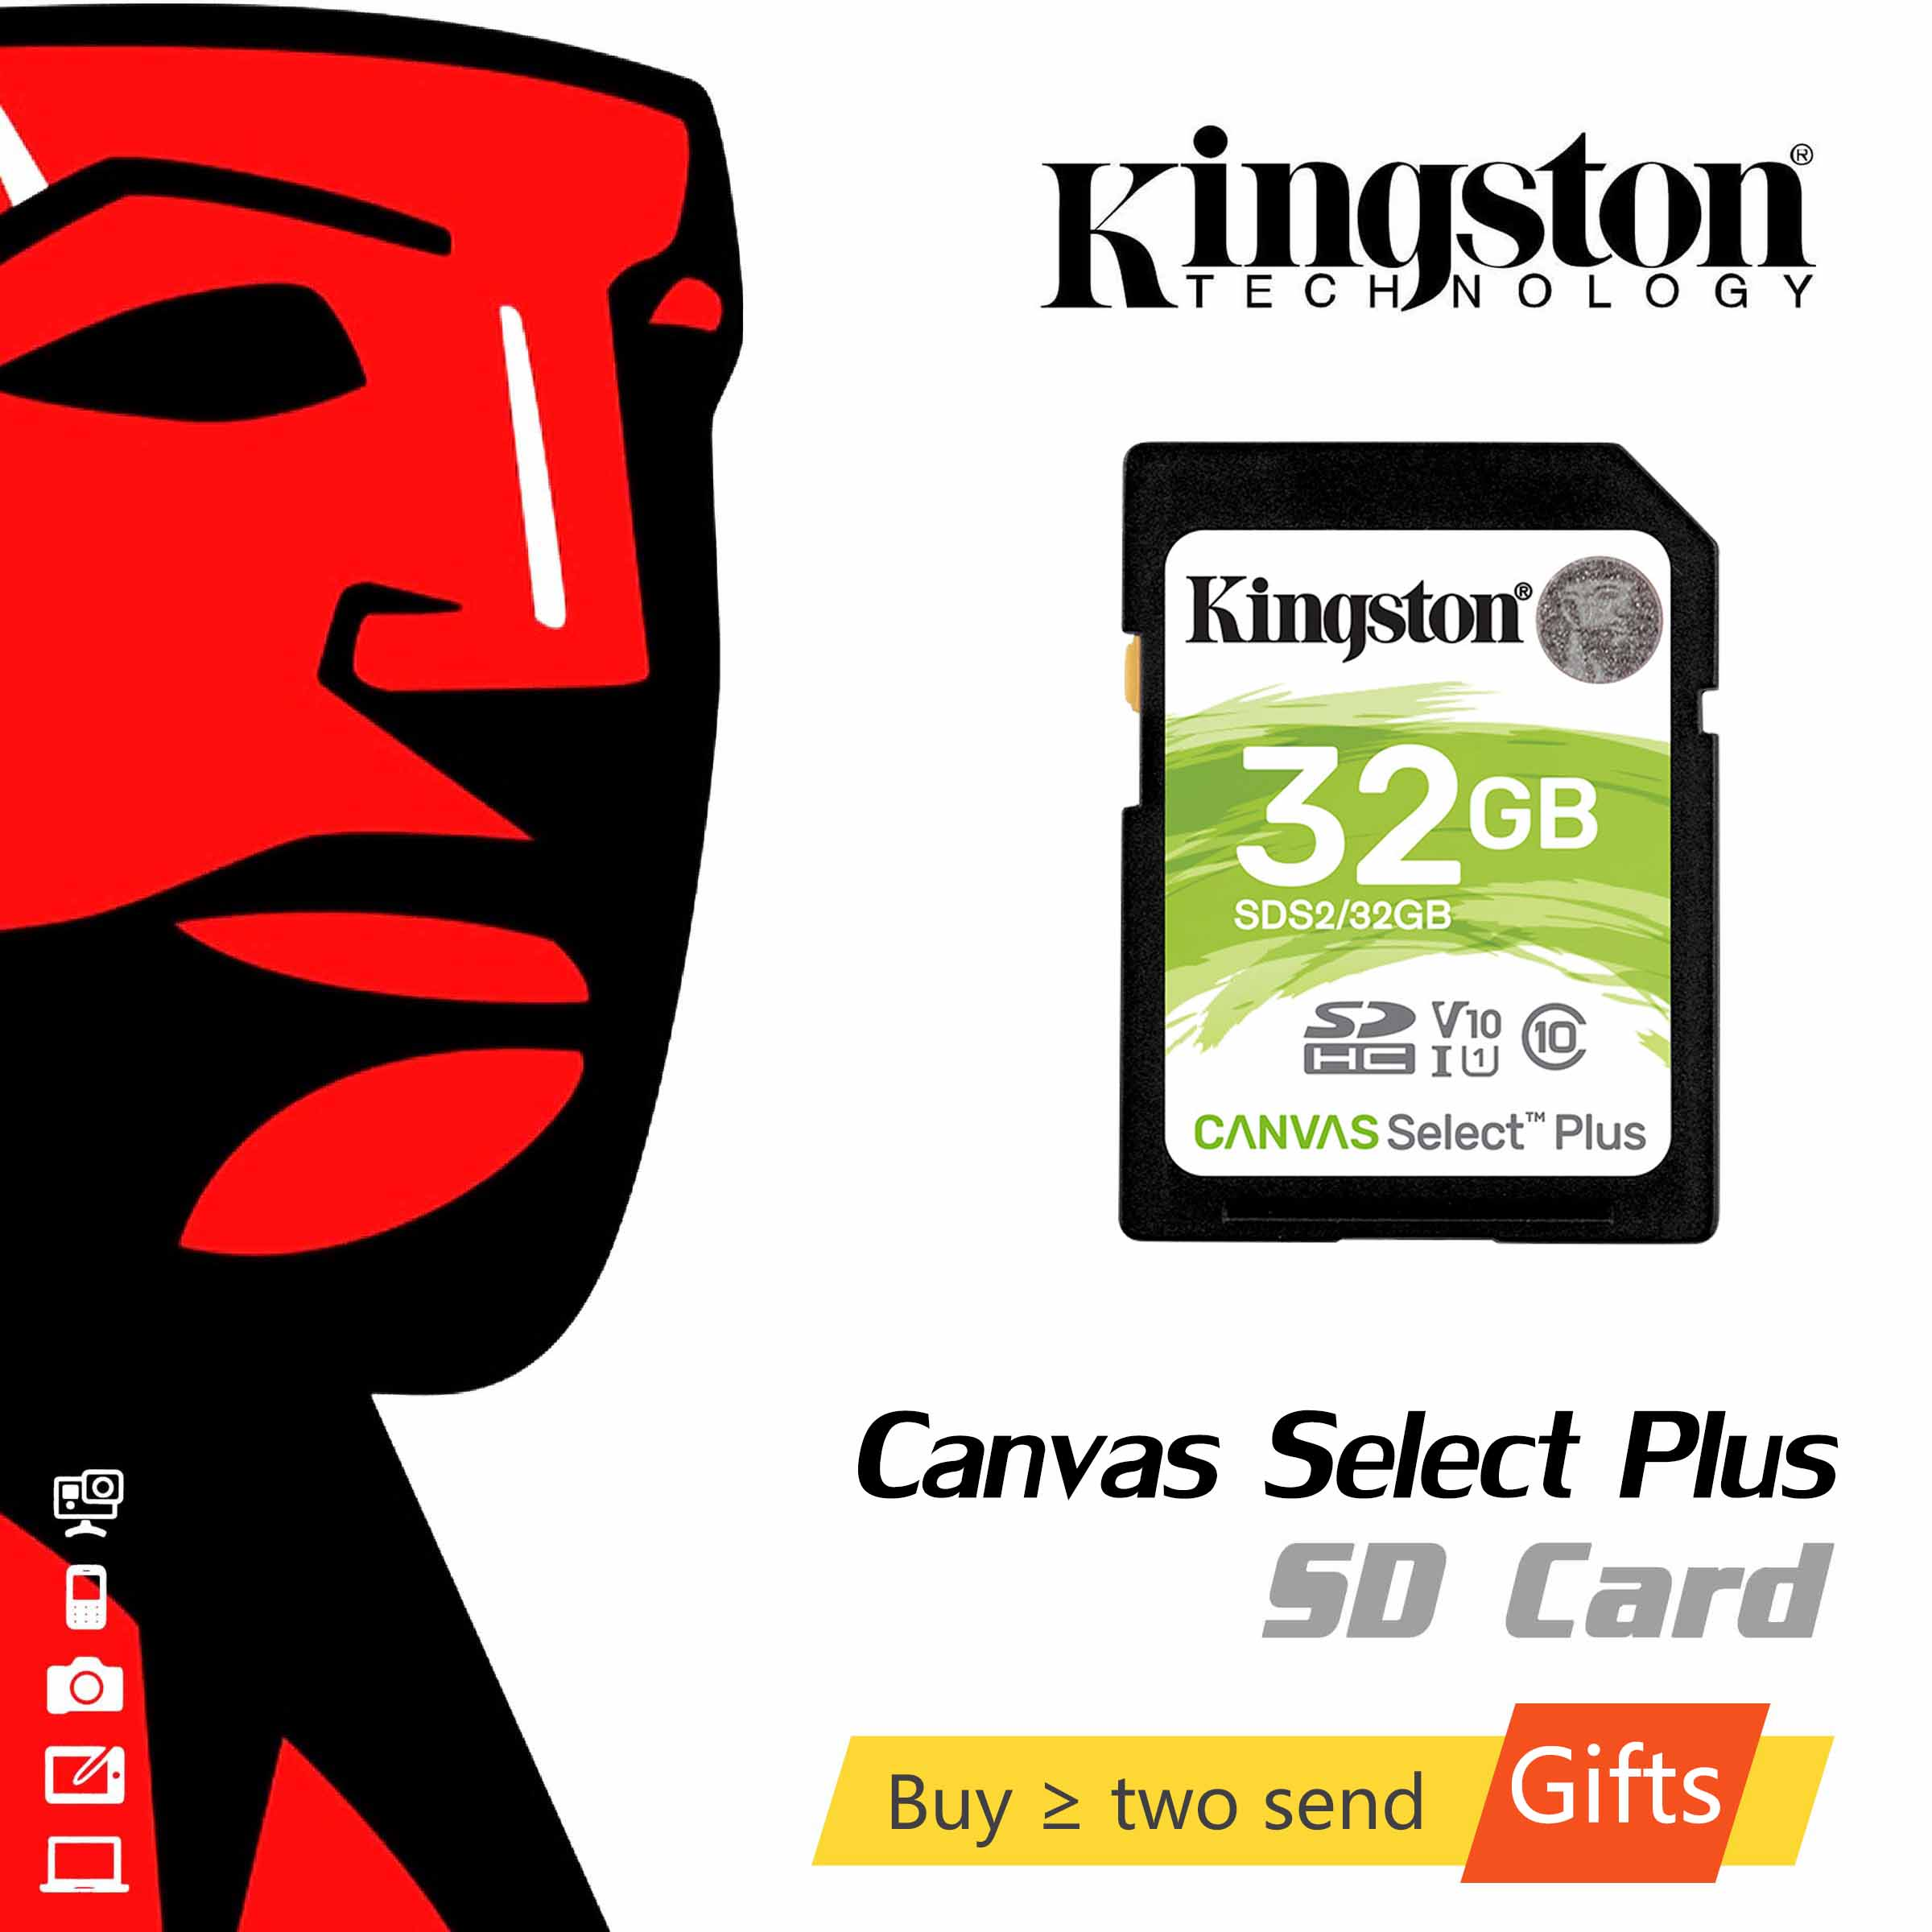 Kingston toile sélectionner Plus carte SD 32GB 64GB 128GB carte mémoire cartao de memória Micro carte SD 256GB pour caméra vidéo 4K